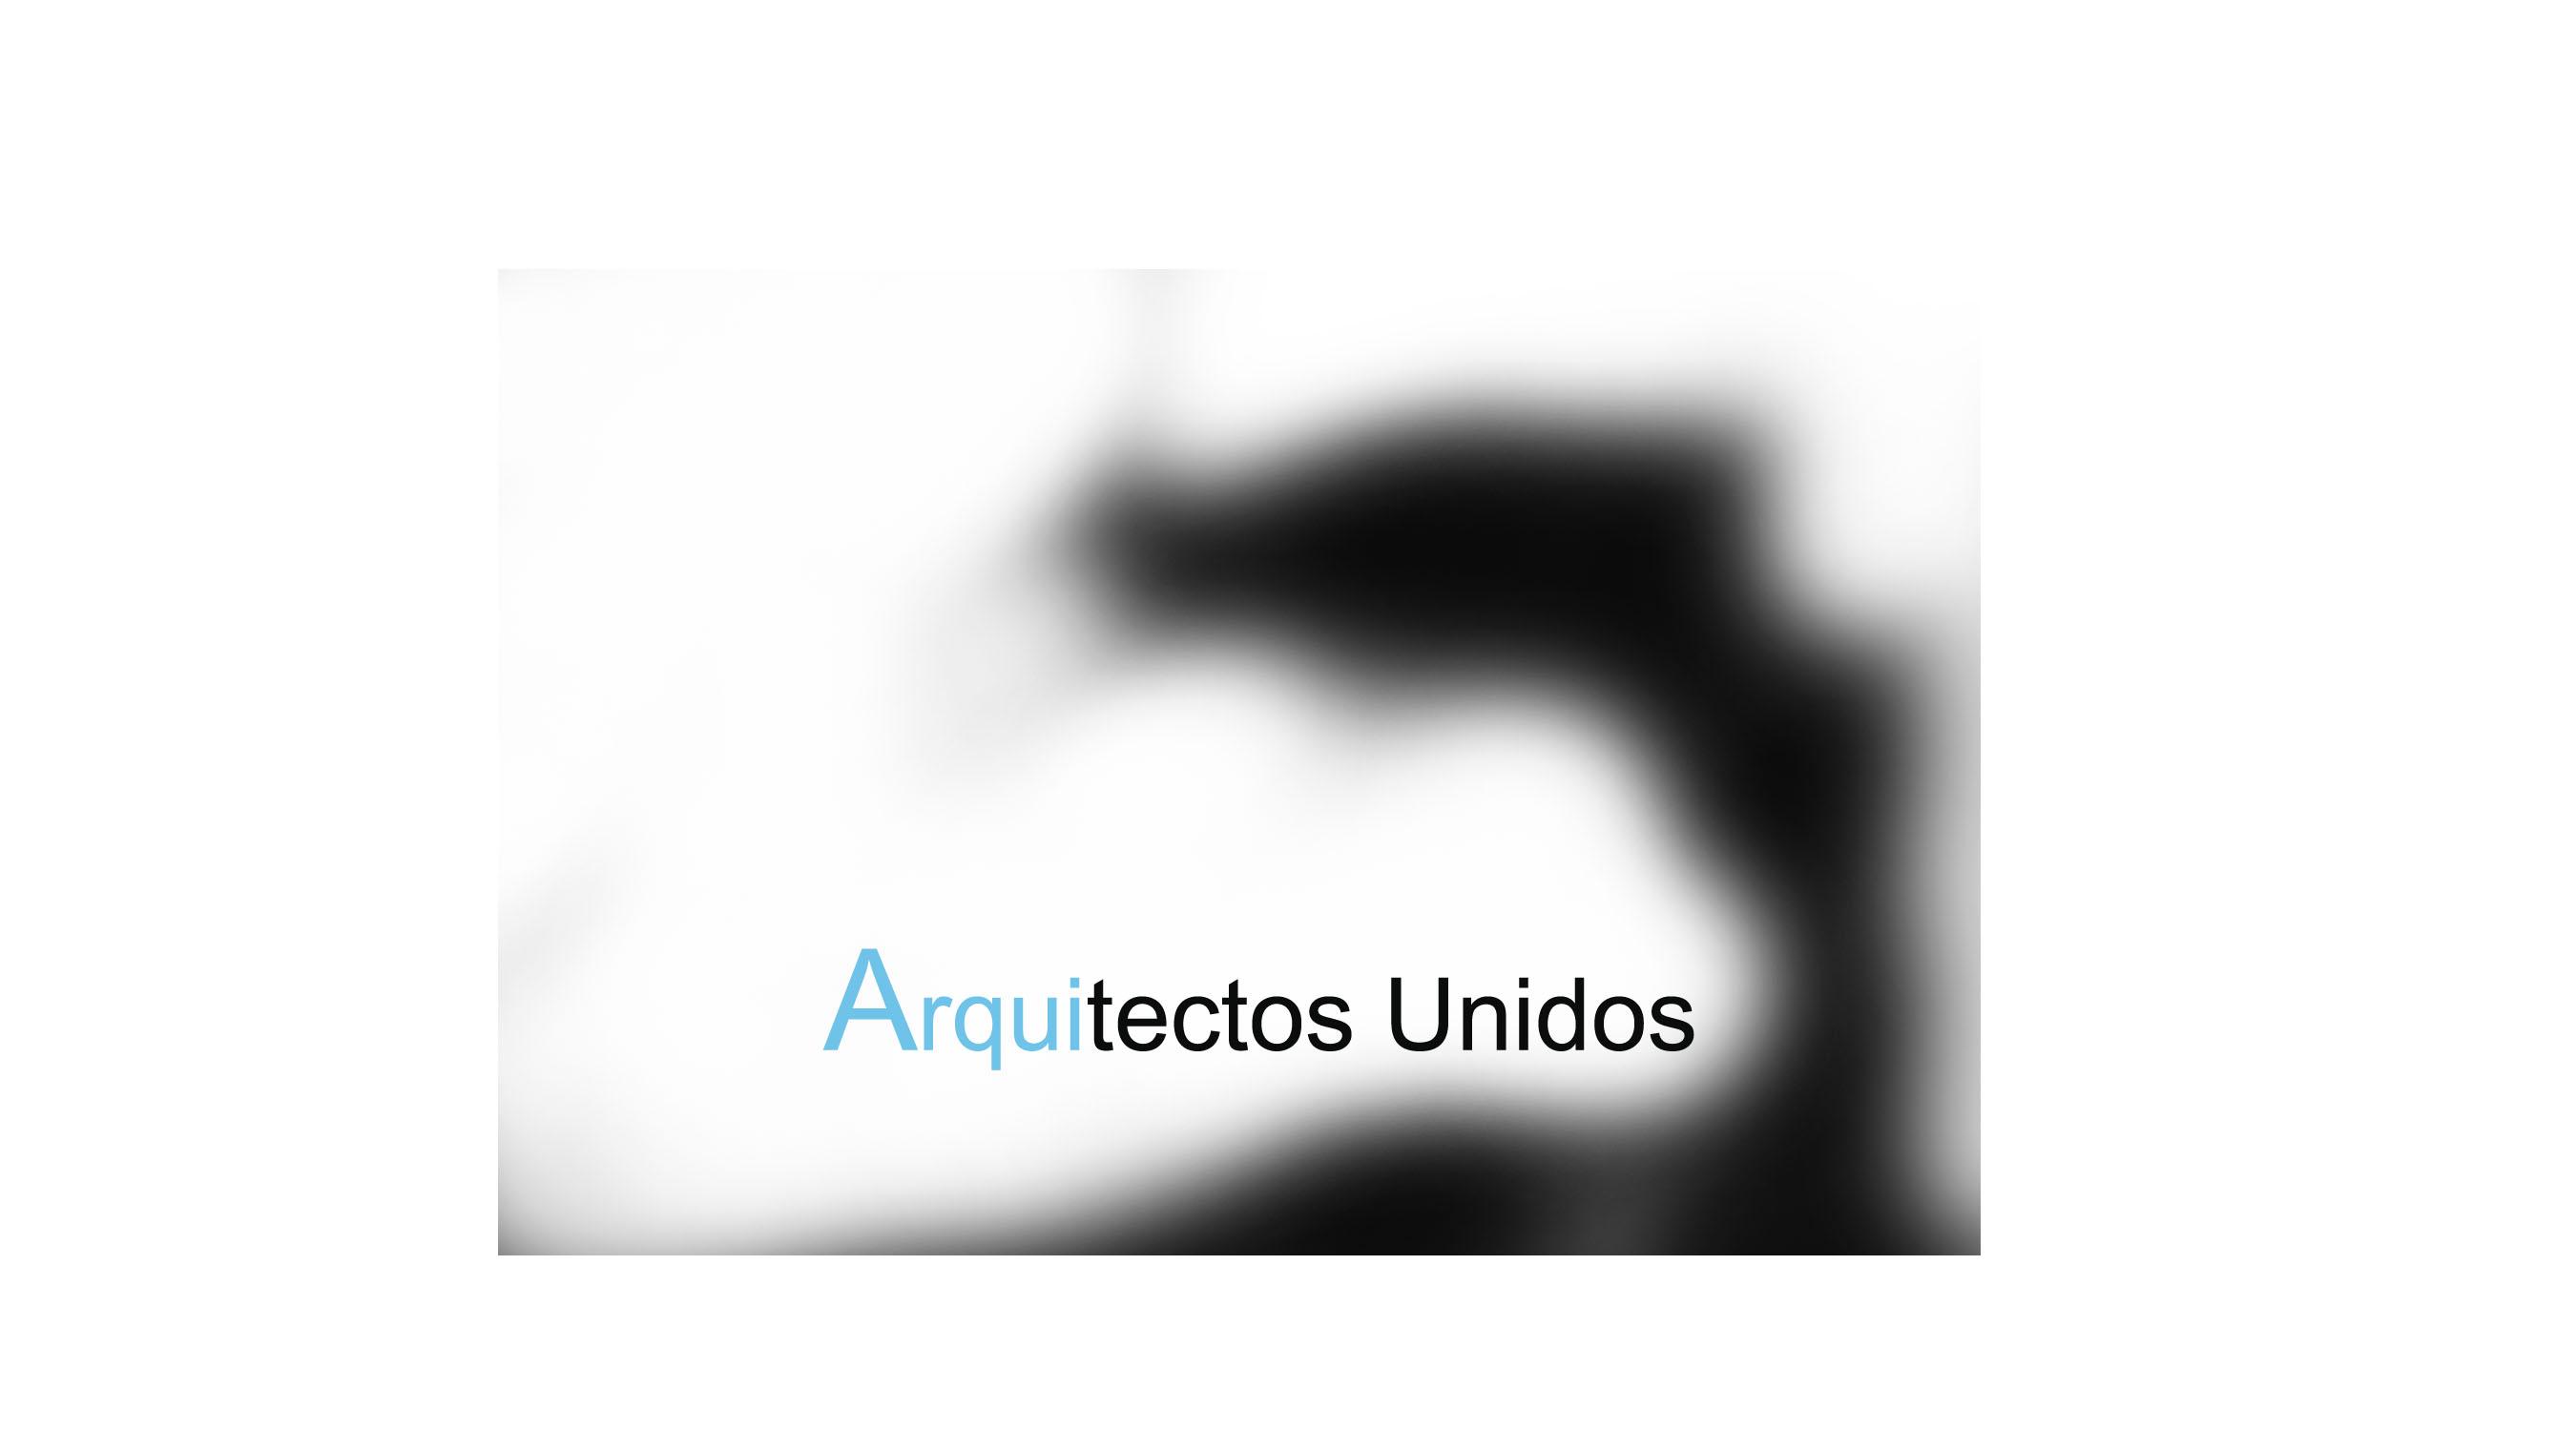 Arquitectos Unidos